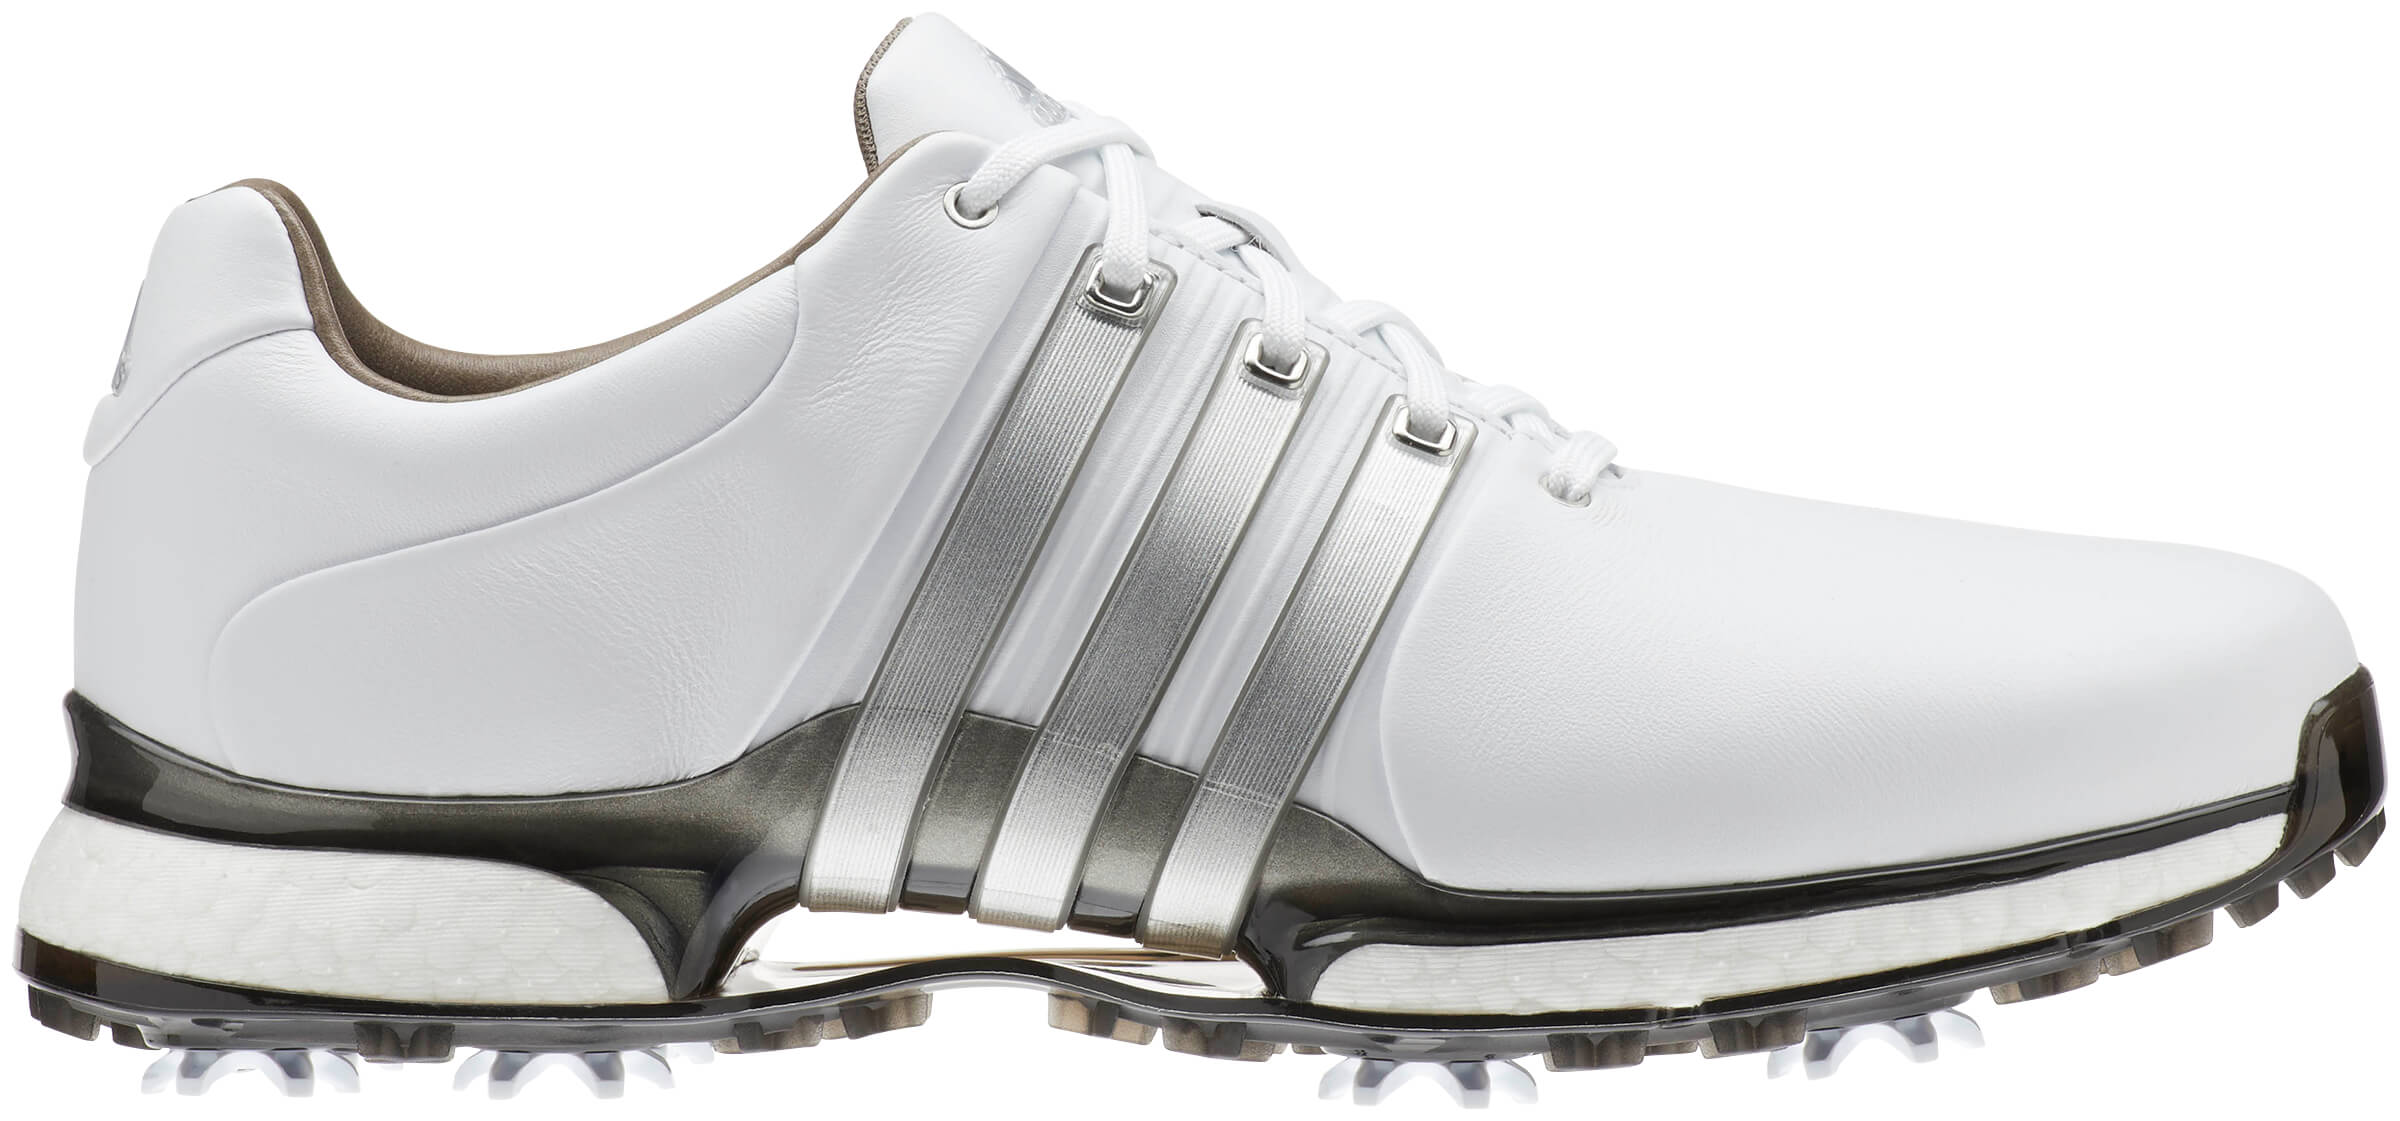 Details about Adidas Tour 360 XT Golf Shoes WhiteSilver Men's 2019 Boost New Choose Size!